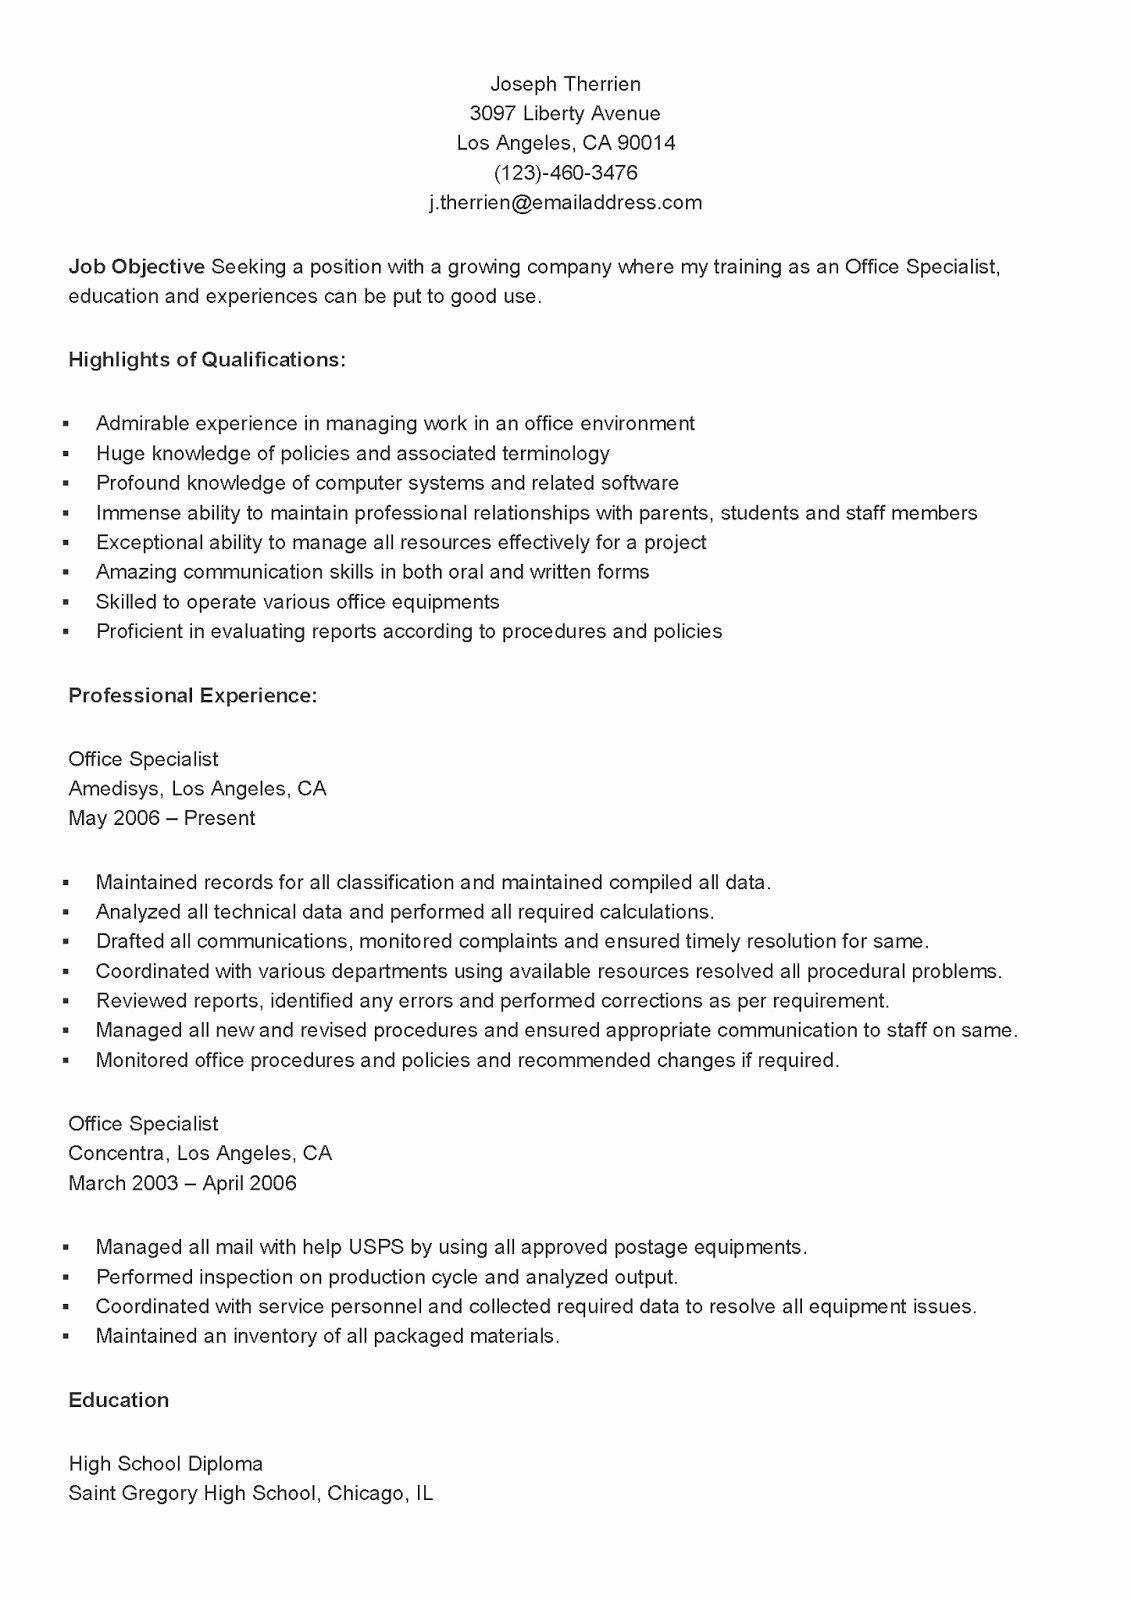 Cover Letter format Uf Unique Resume Samples Sample Fice Specialist Resume